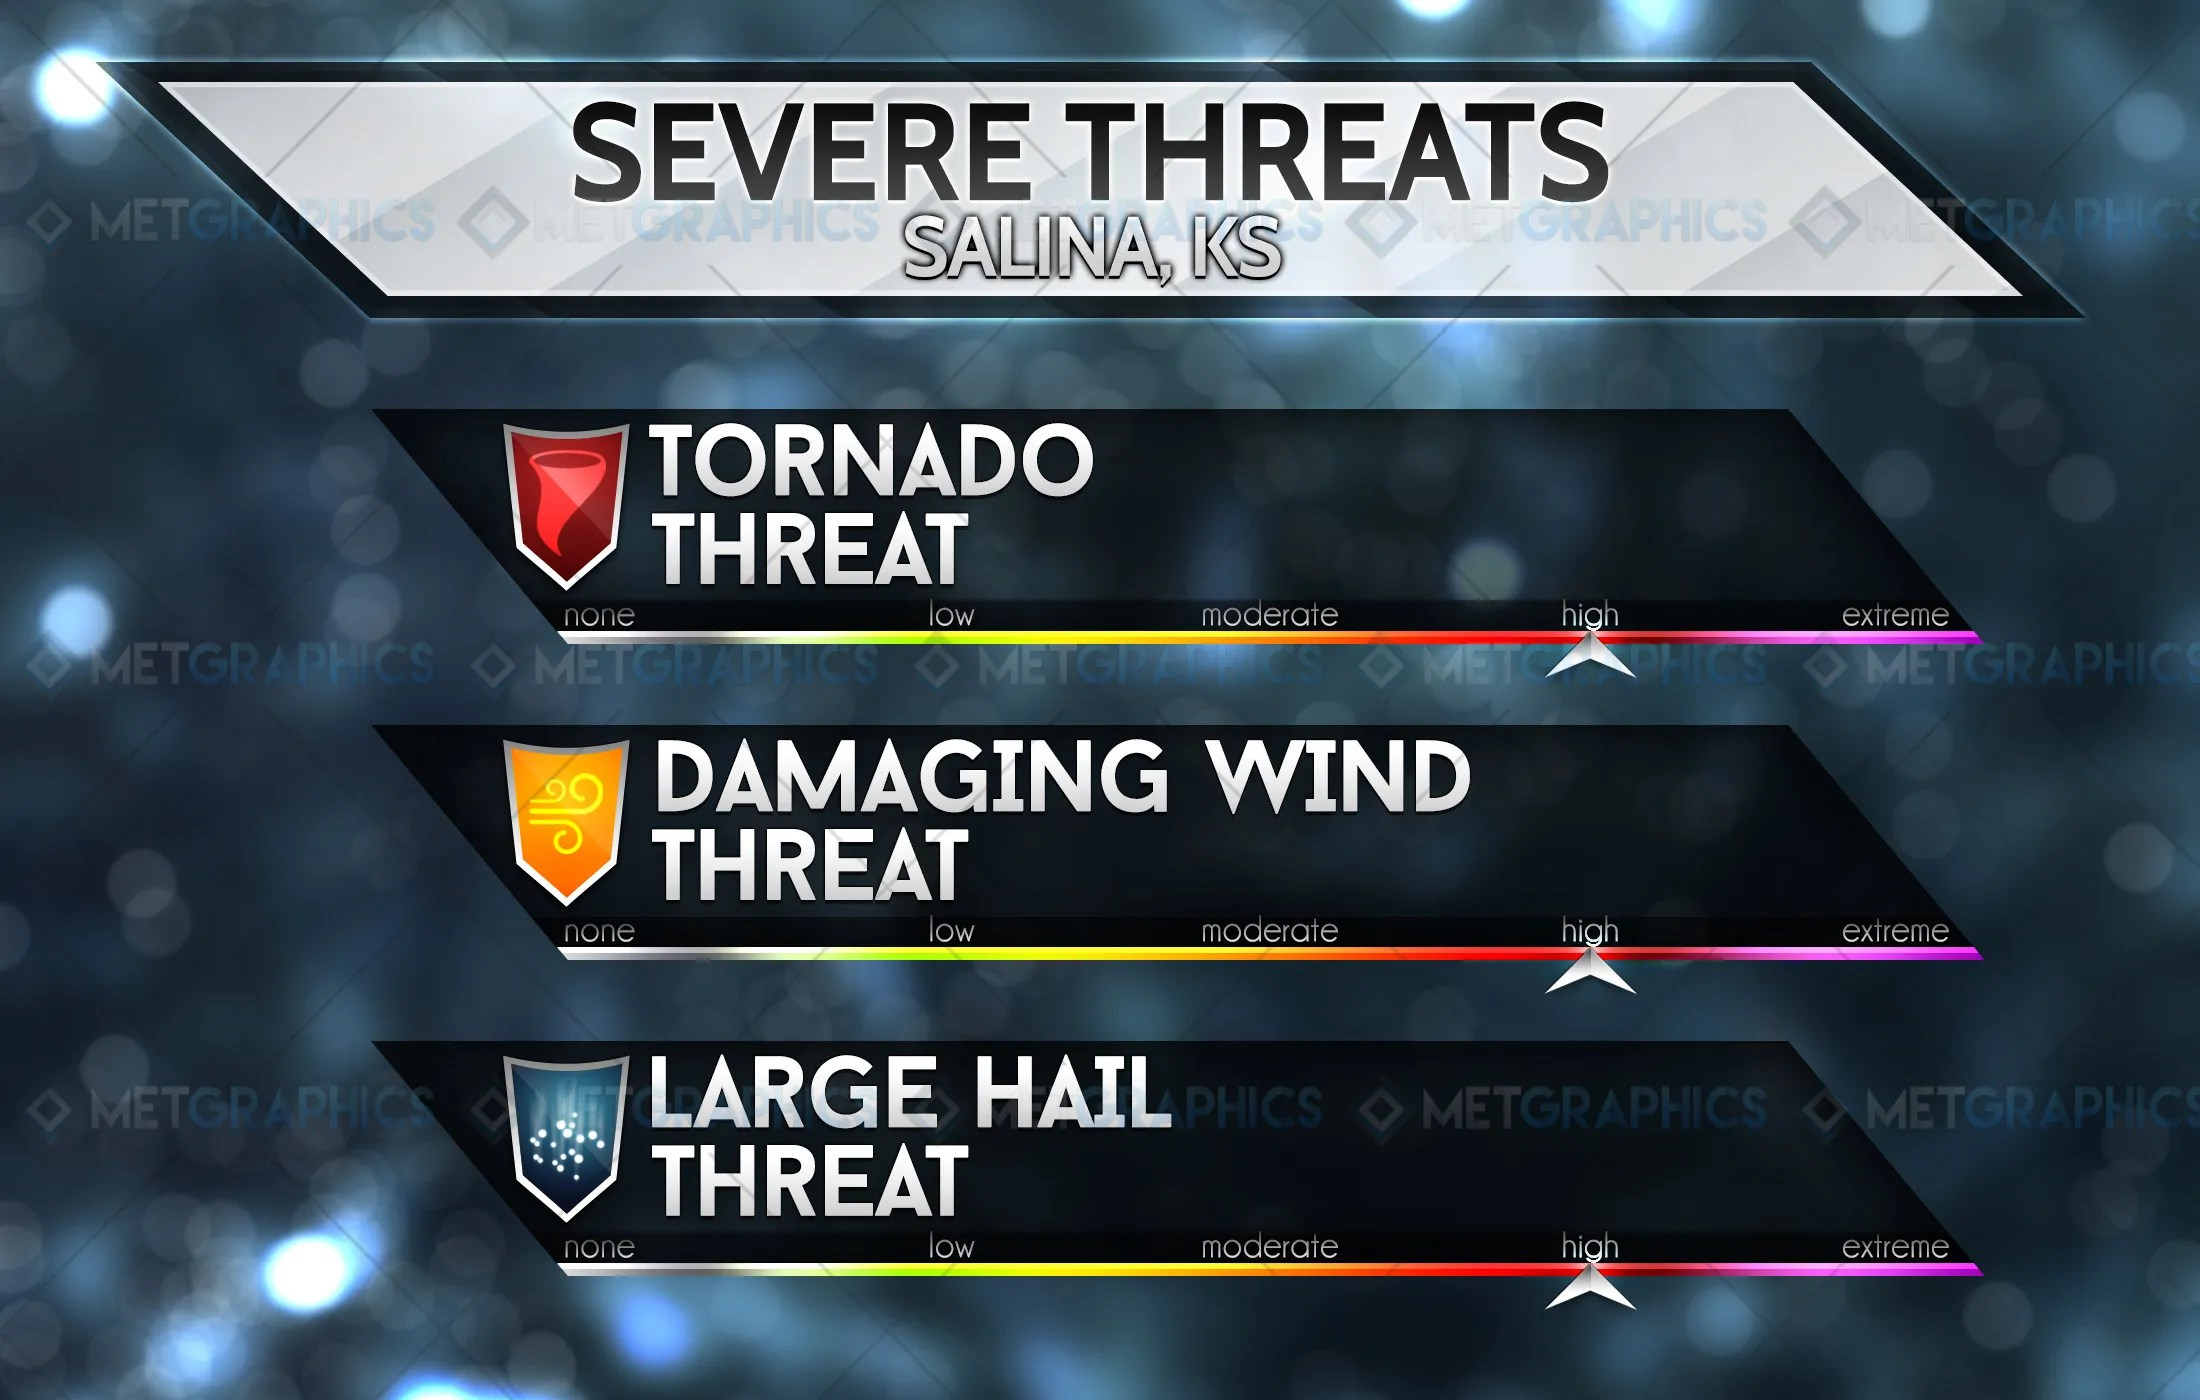 Severe Threats